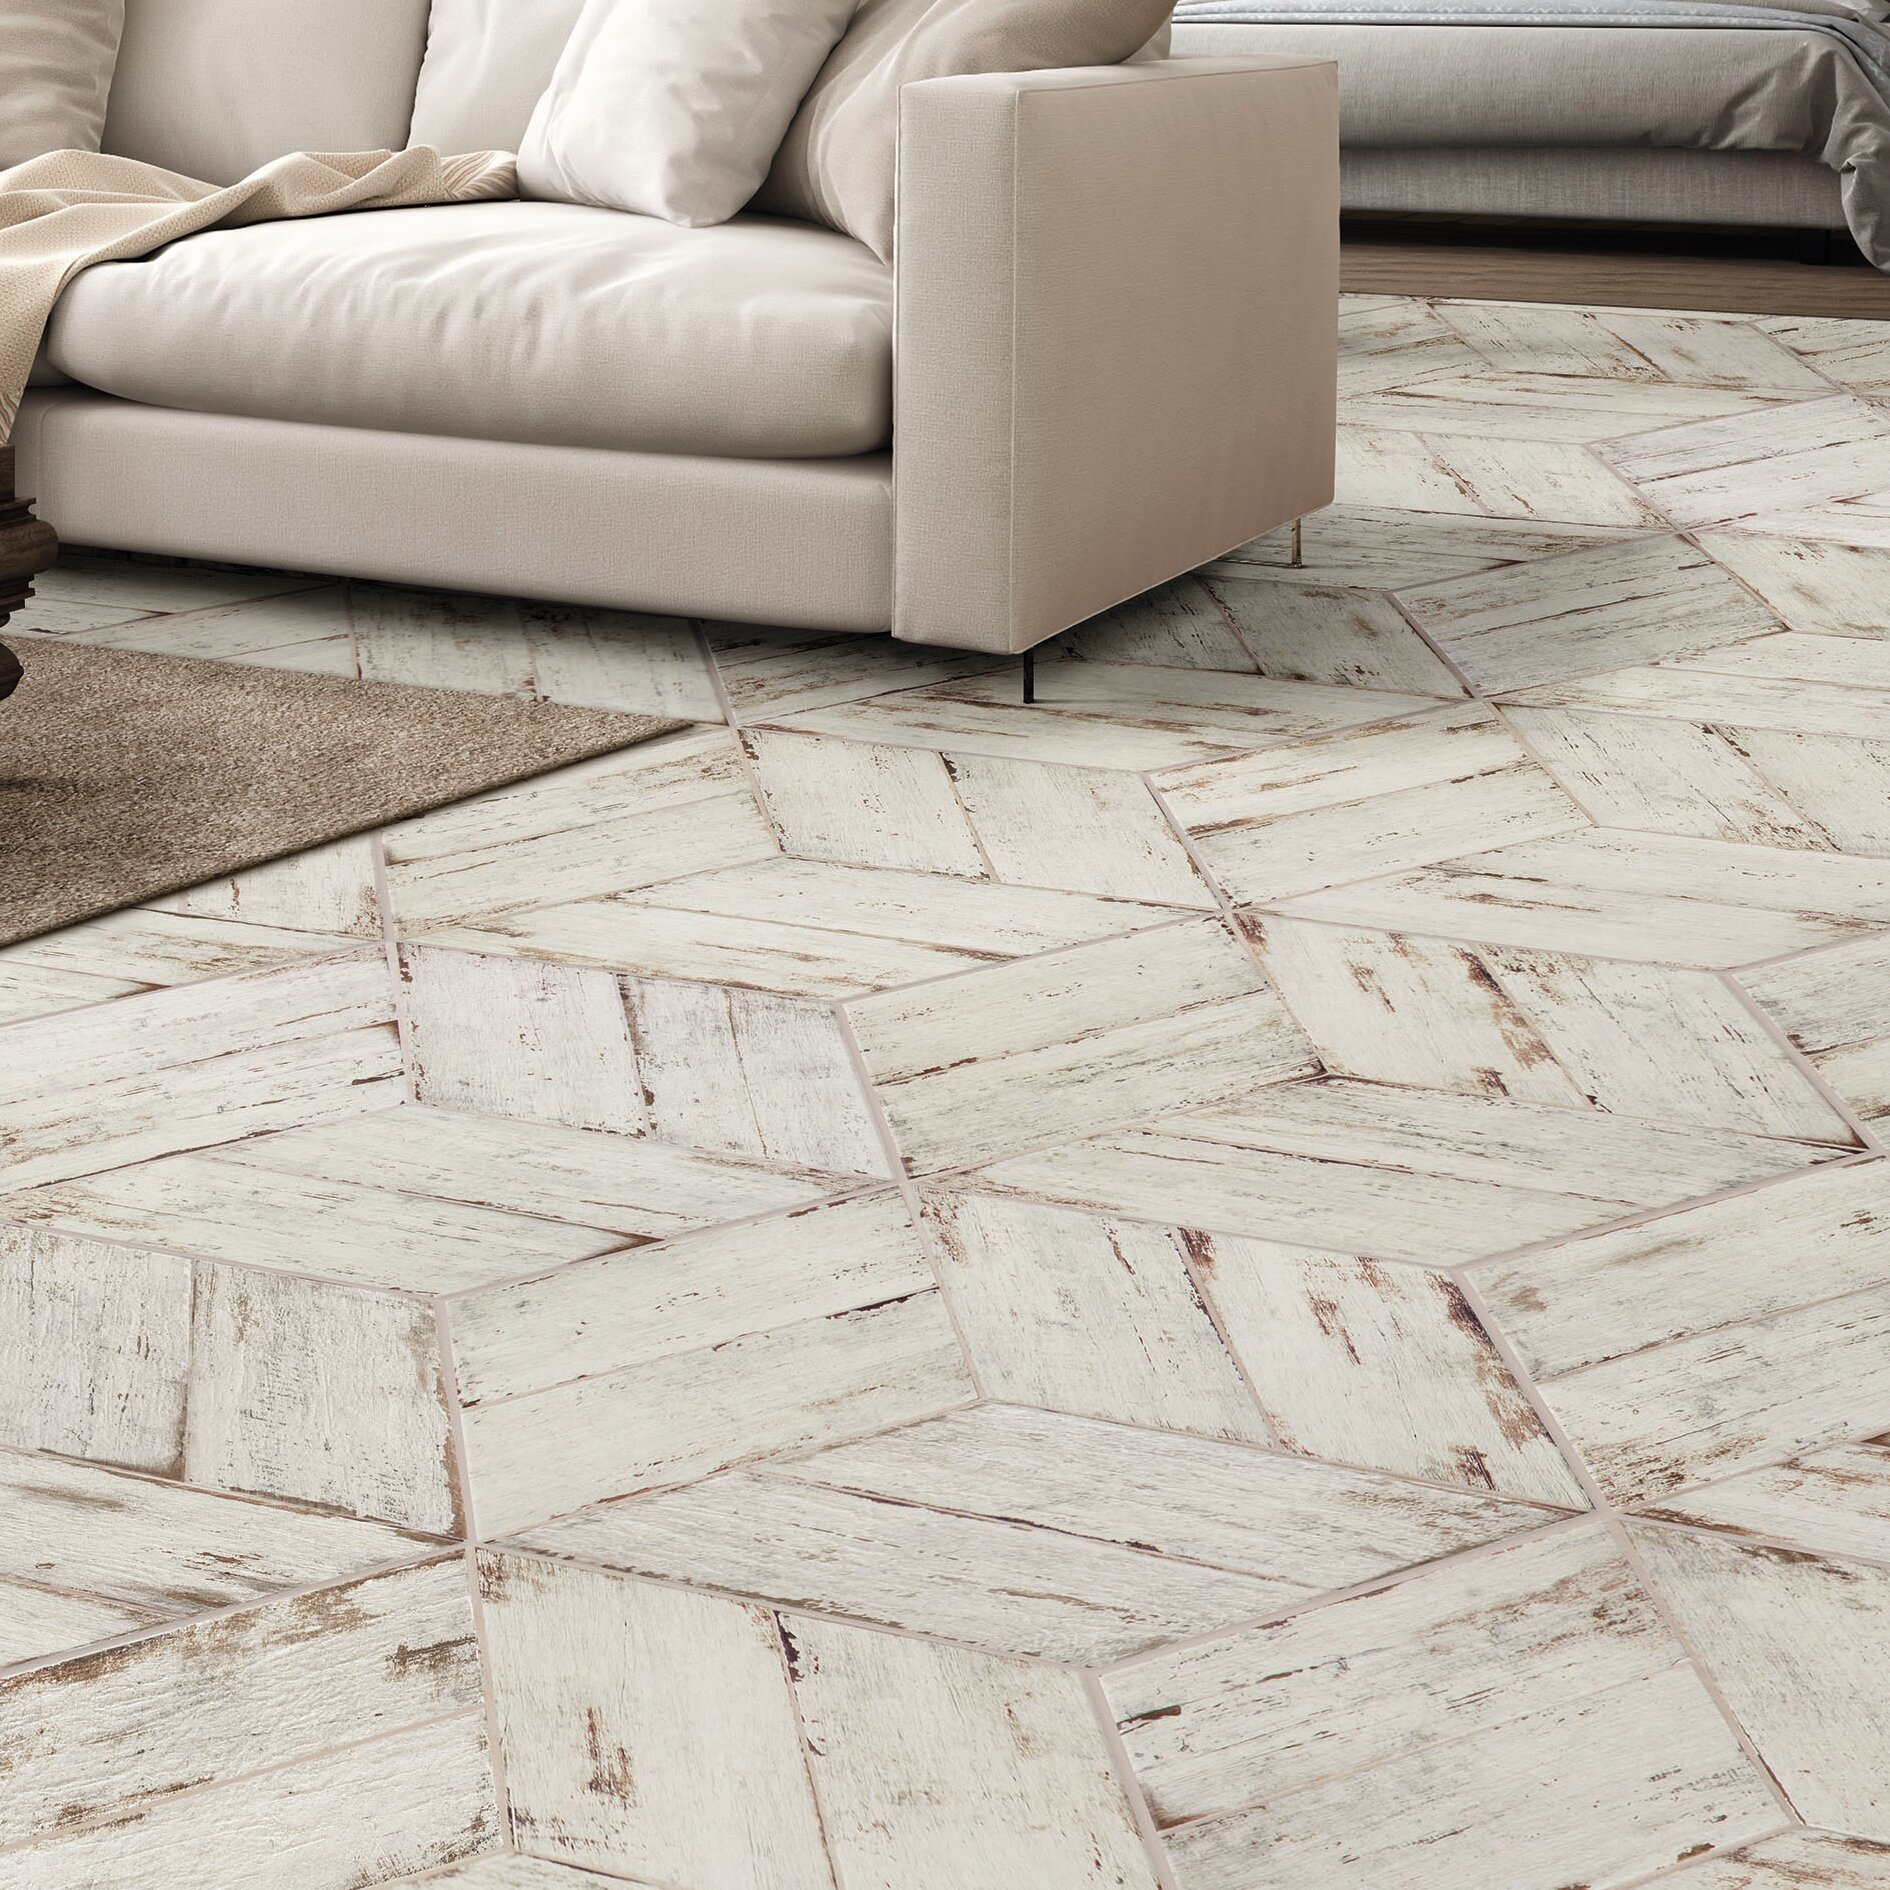 Elitetile Rama 7 X 17 Porcelain Wood Look Tile In Blanco